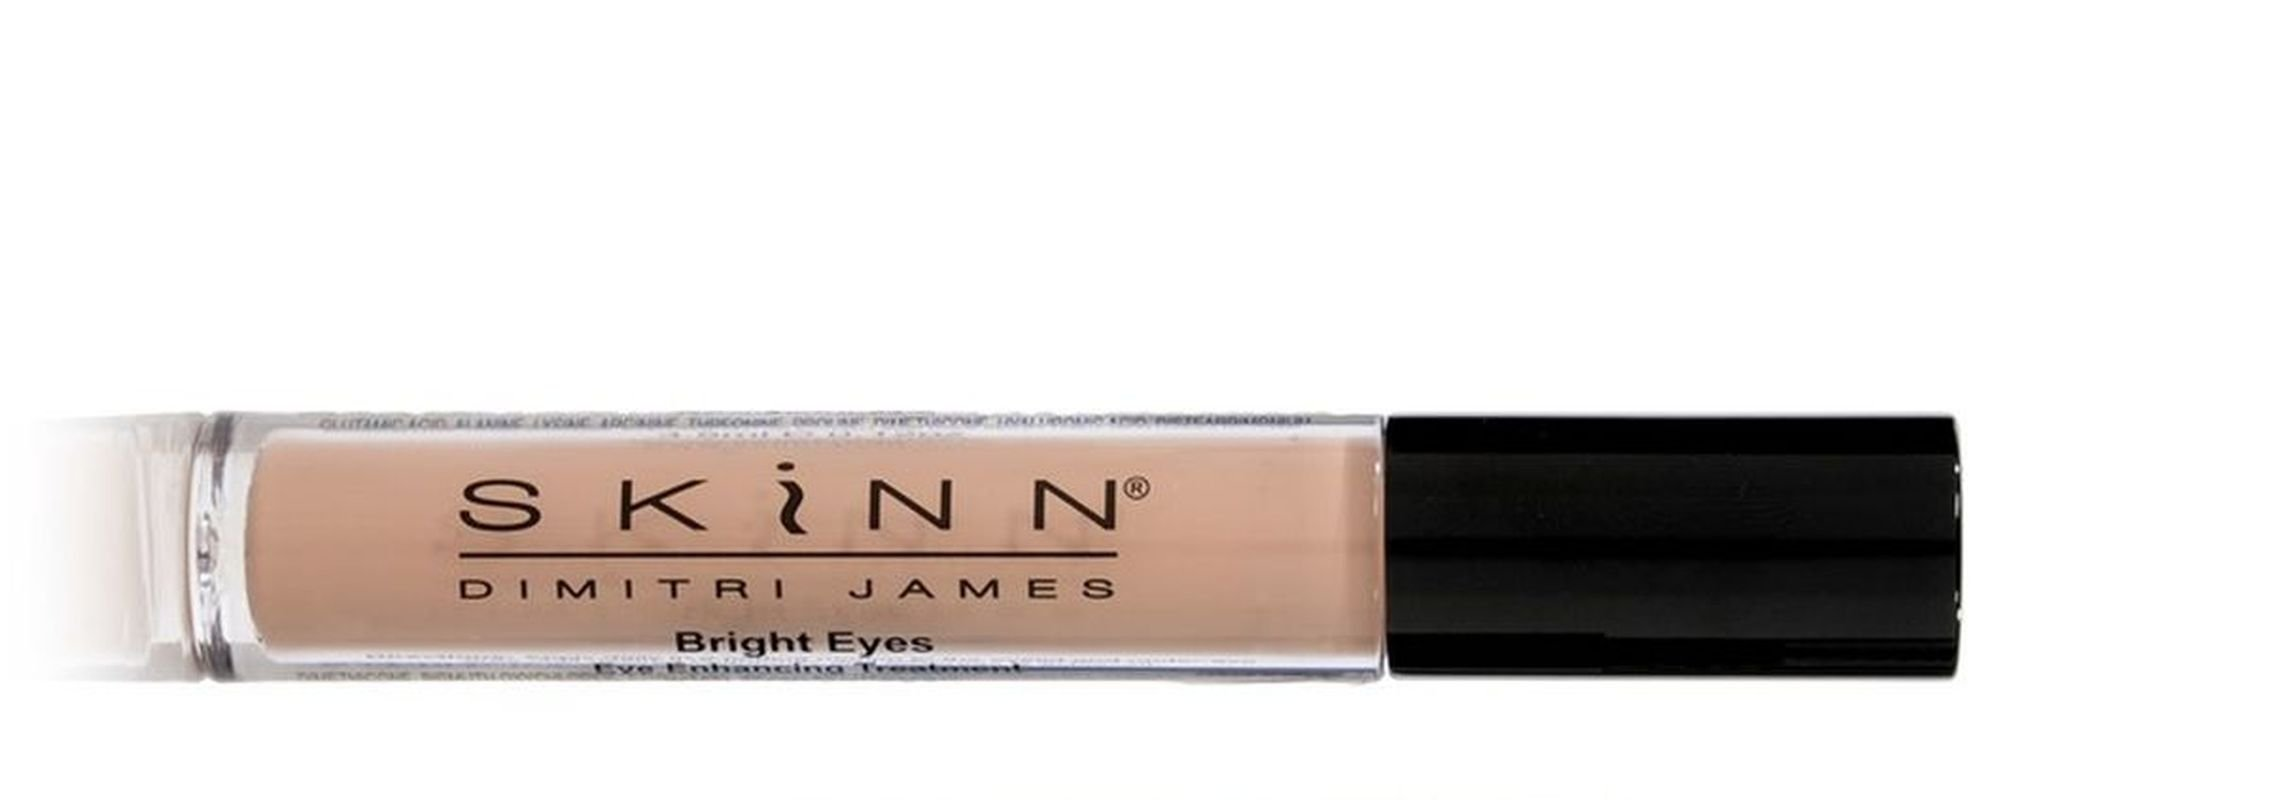 Skinn Cosmetics Bright Eyes Eye Enhancing Treatment-Tube - 0.12 oz